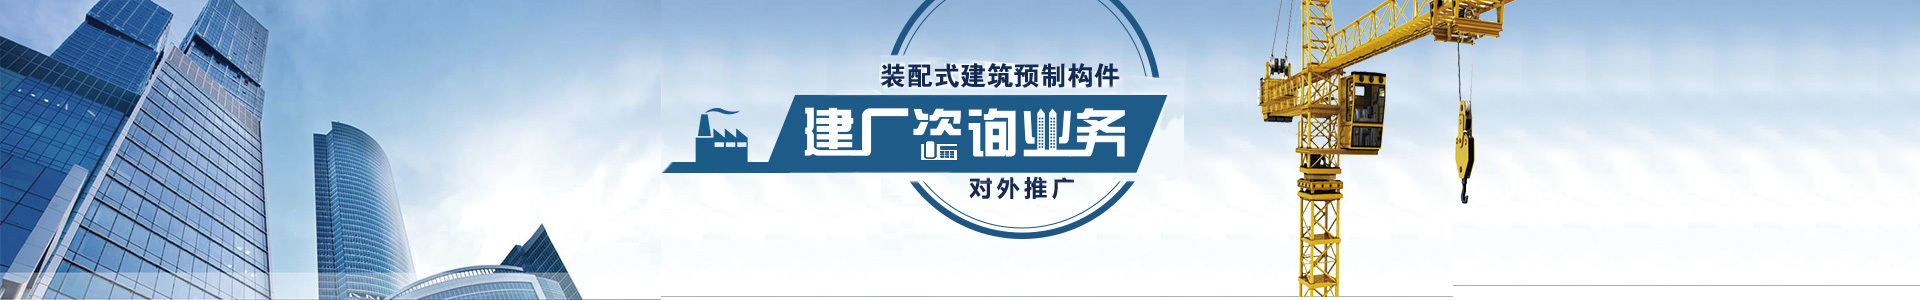 http://igreenbuy-zhaopc-public.oss-cn-shanghai.aliyuncs.com/common/zhaopcbanner%E5%BB%BA%E5%8E%82.jpg